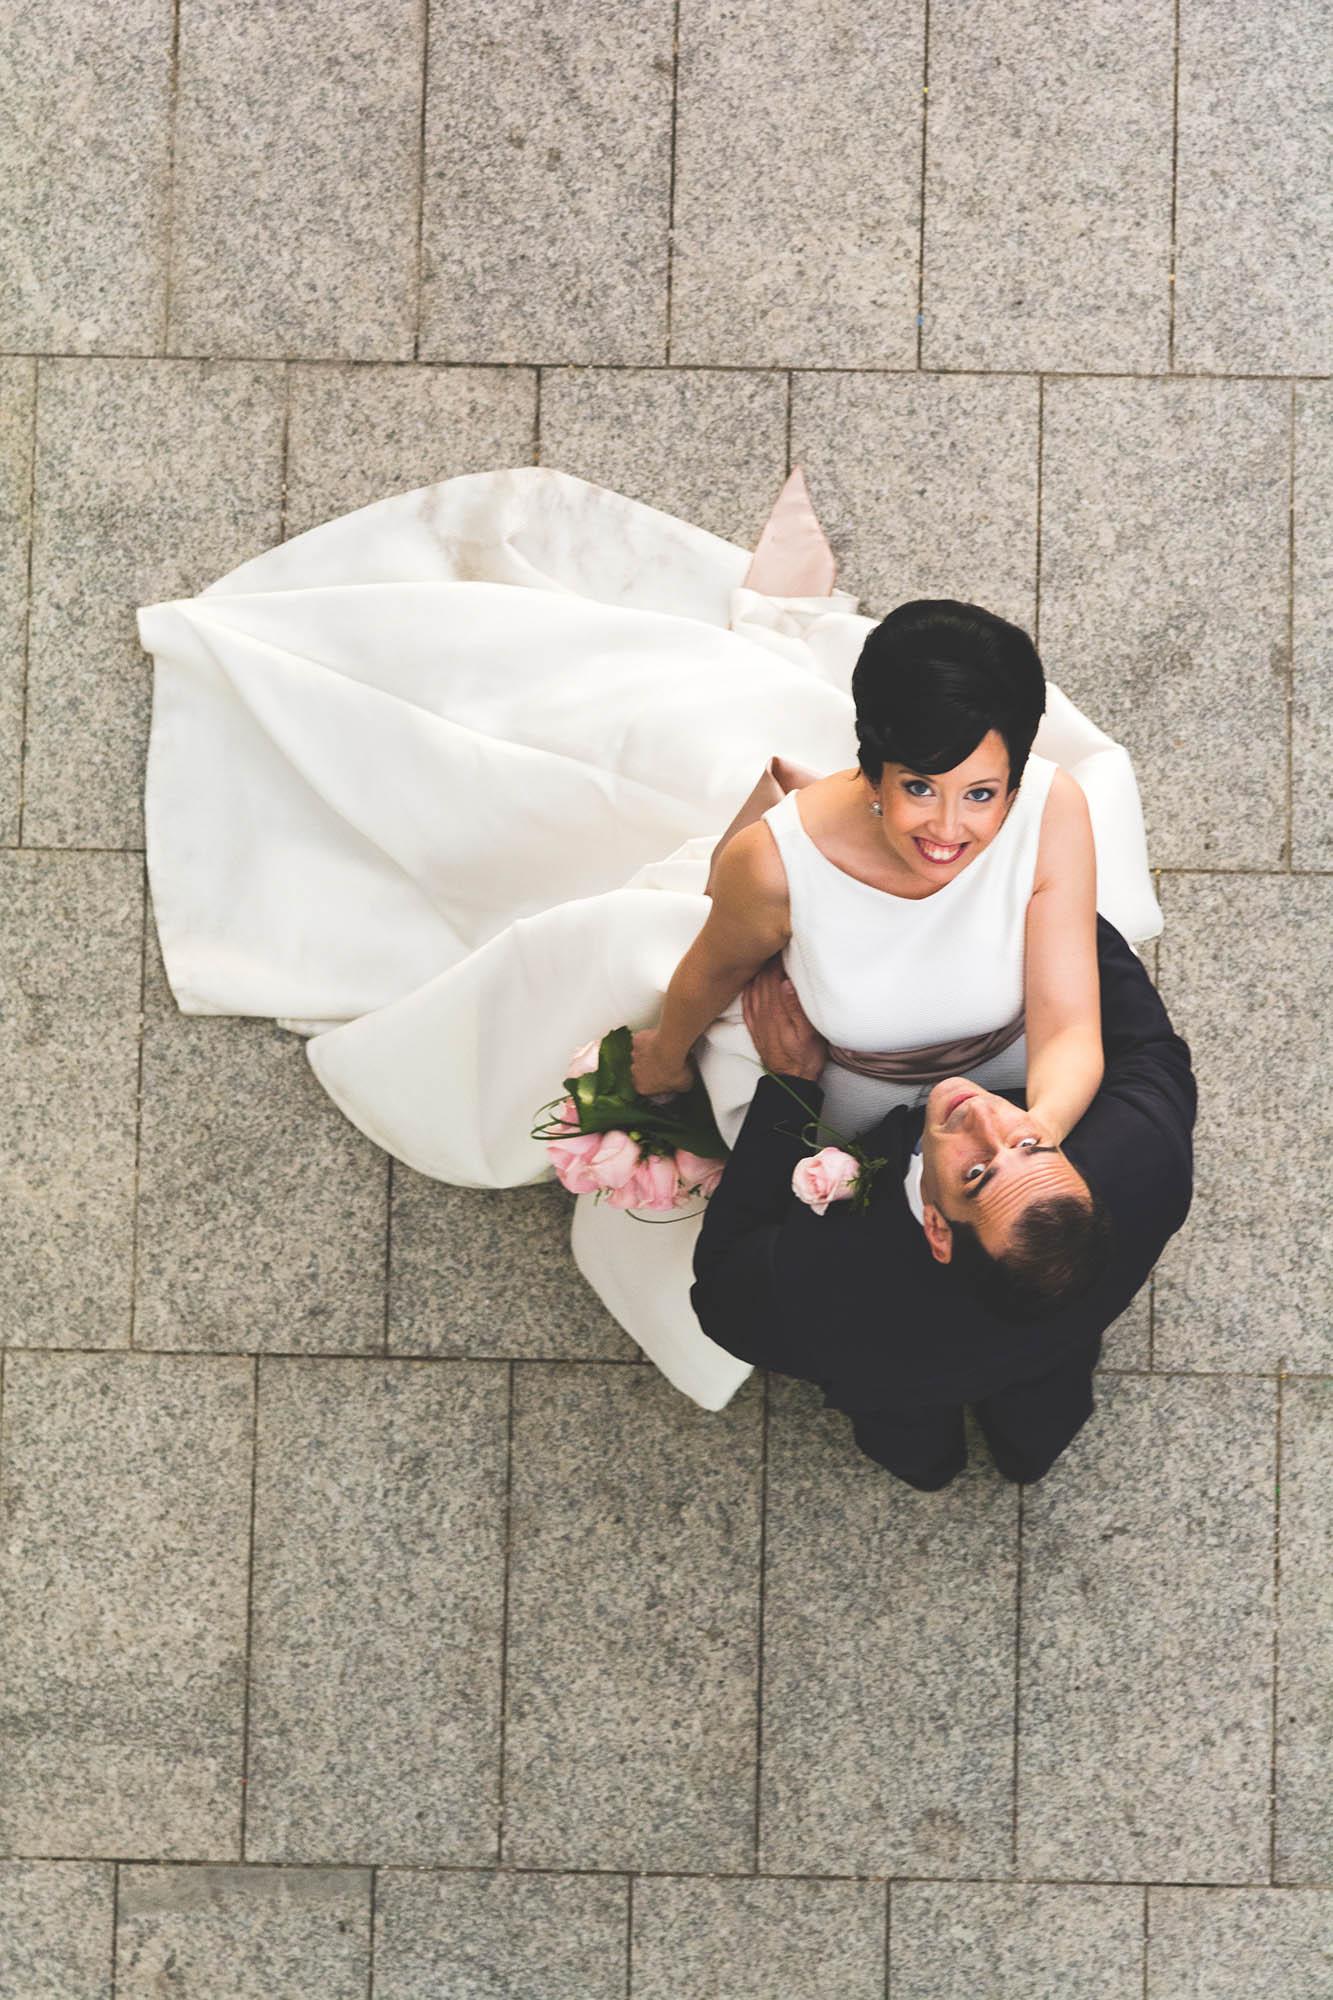 Reportaje Básico de Boda. Reportajes de boda Económicos. Fotógrafo de Bodas en Zaragoza